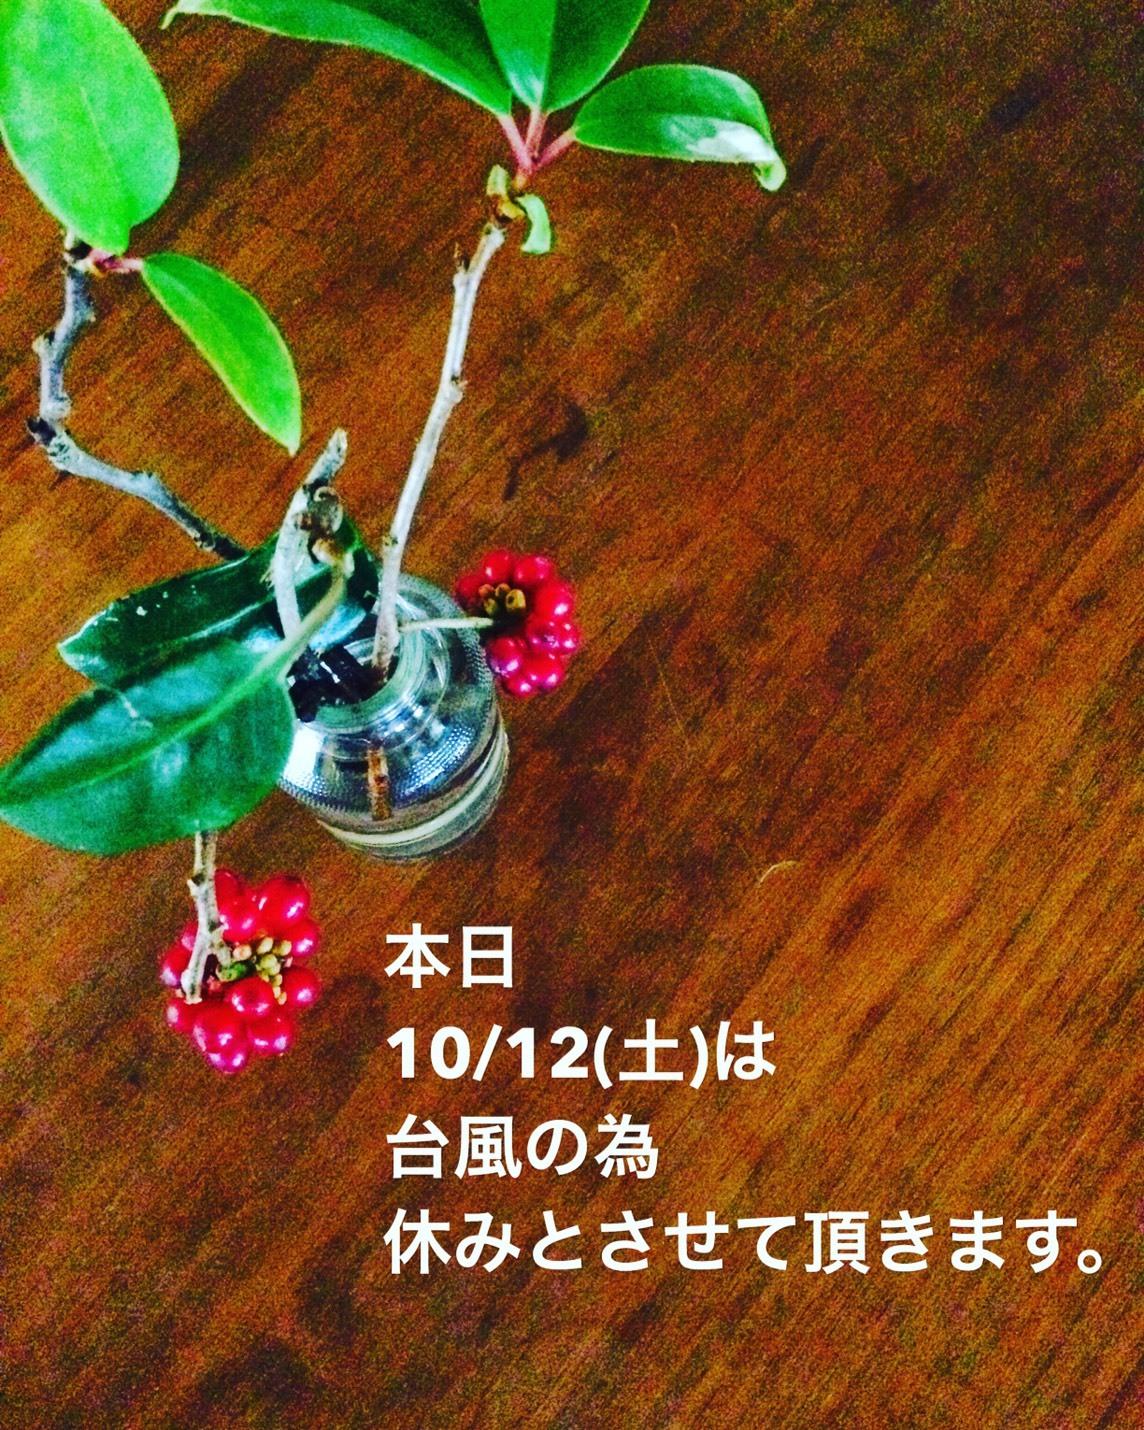 S__22536194.jpg